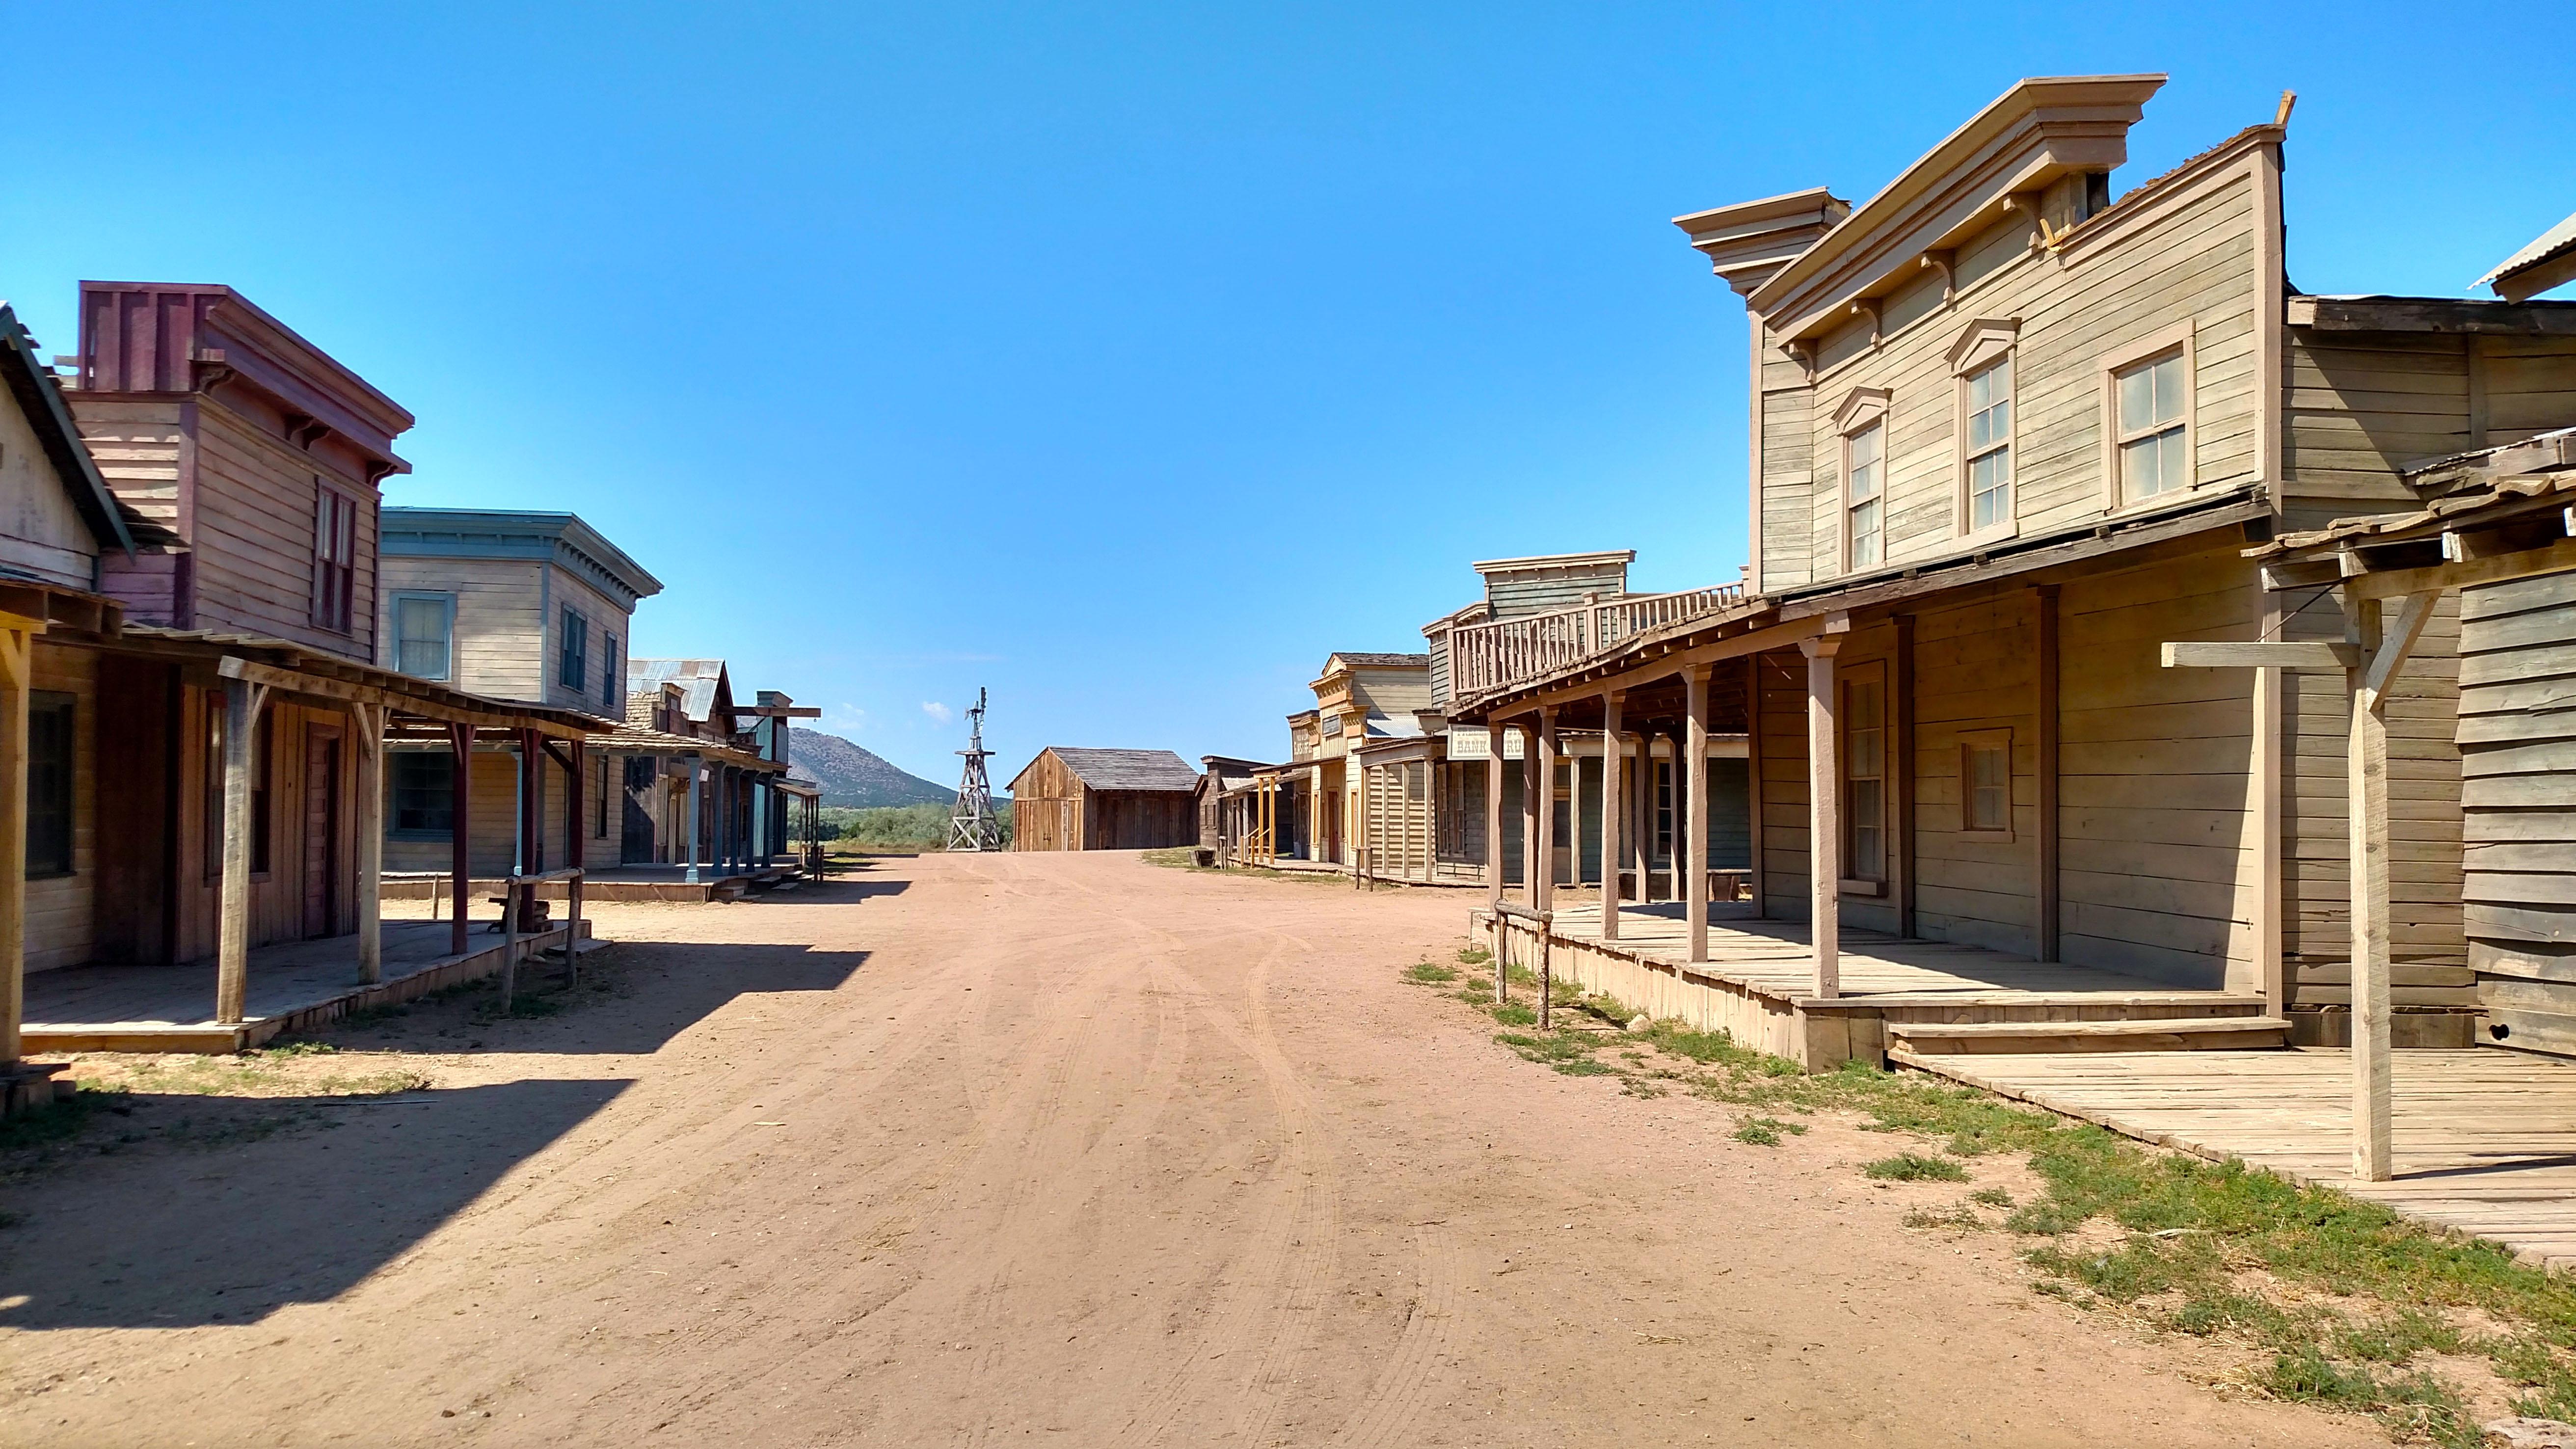 Old western movie settler